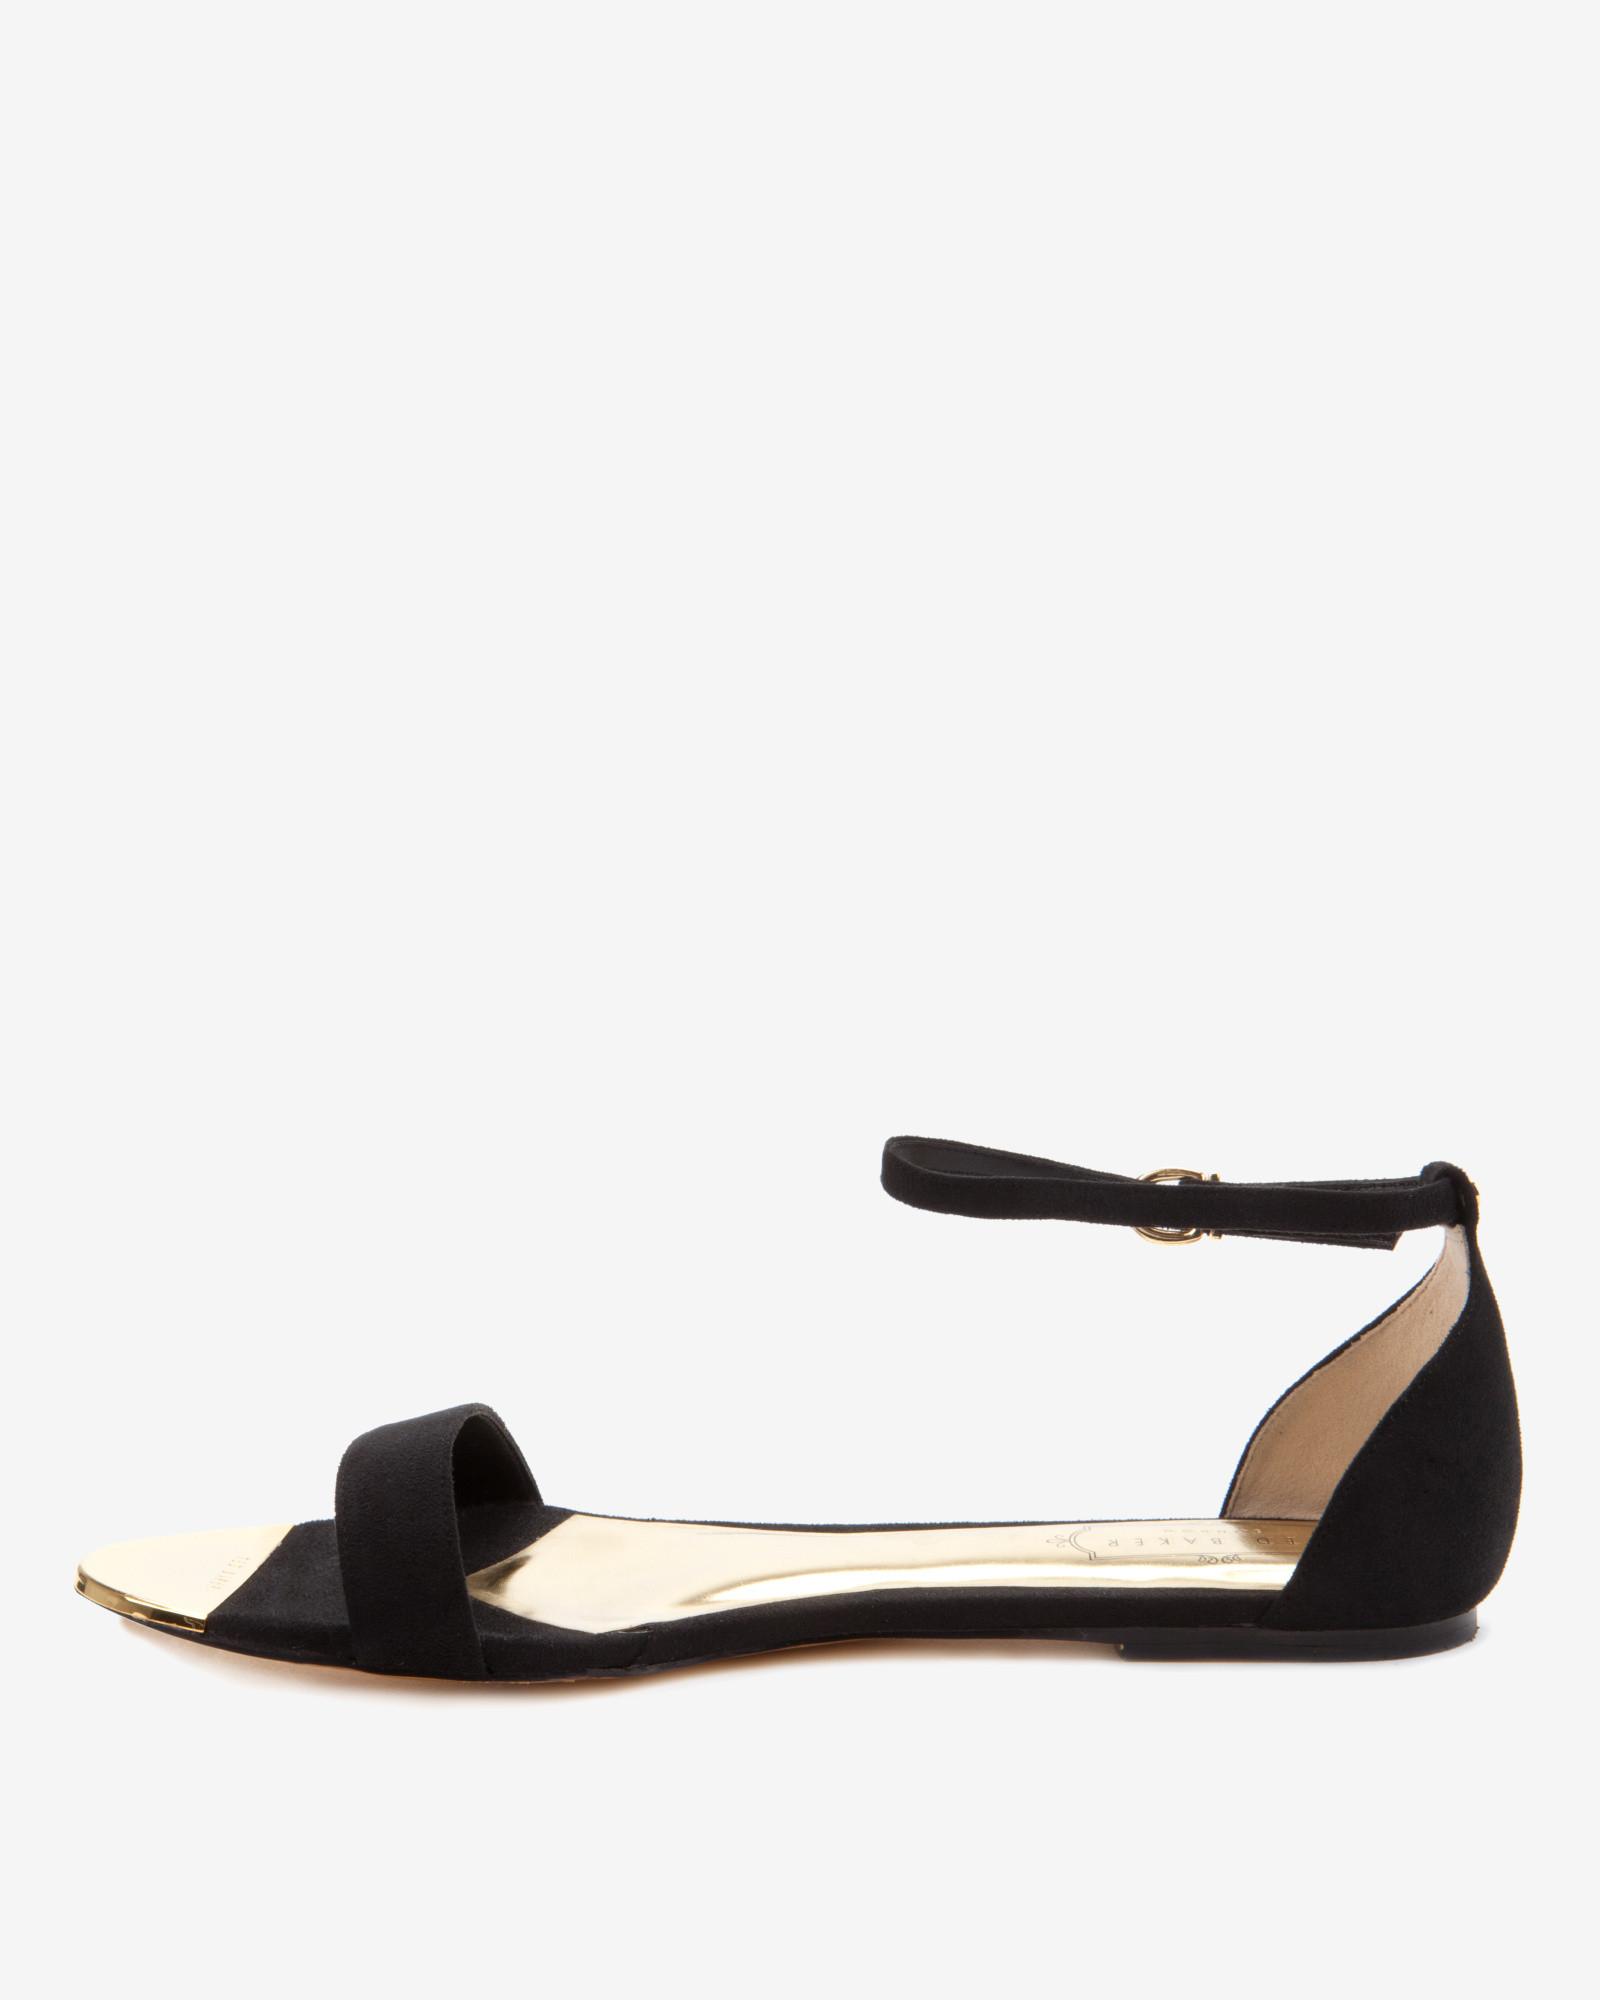 Lyst - Ted Baker Ankle Strap Sandals in Black